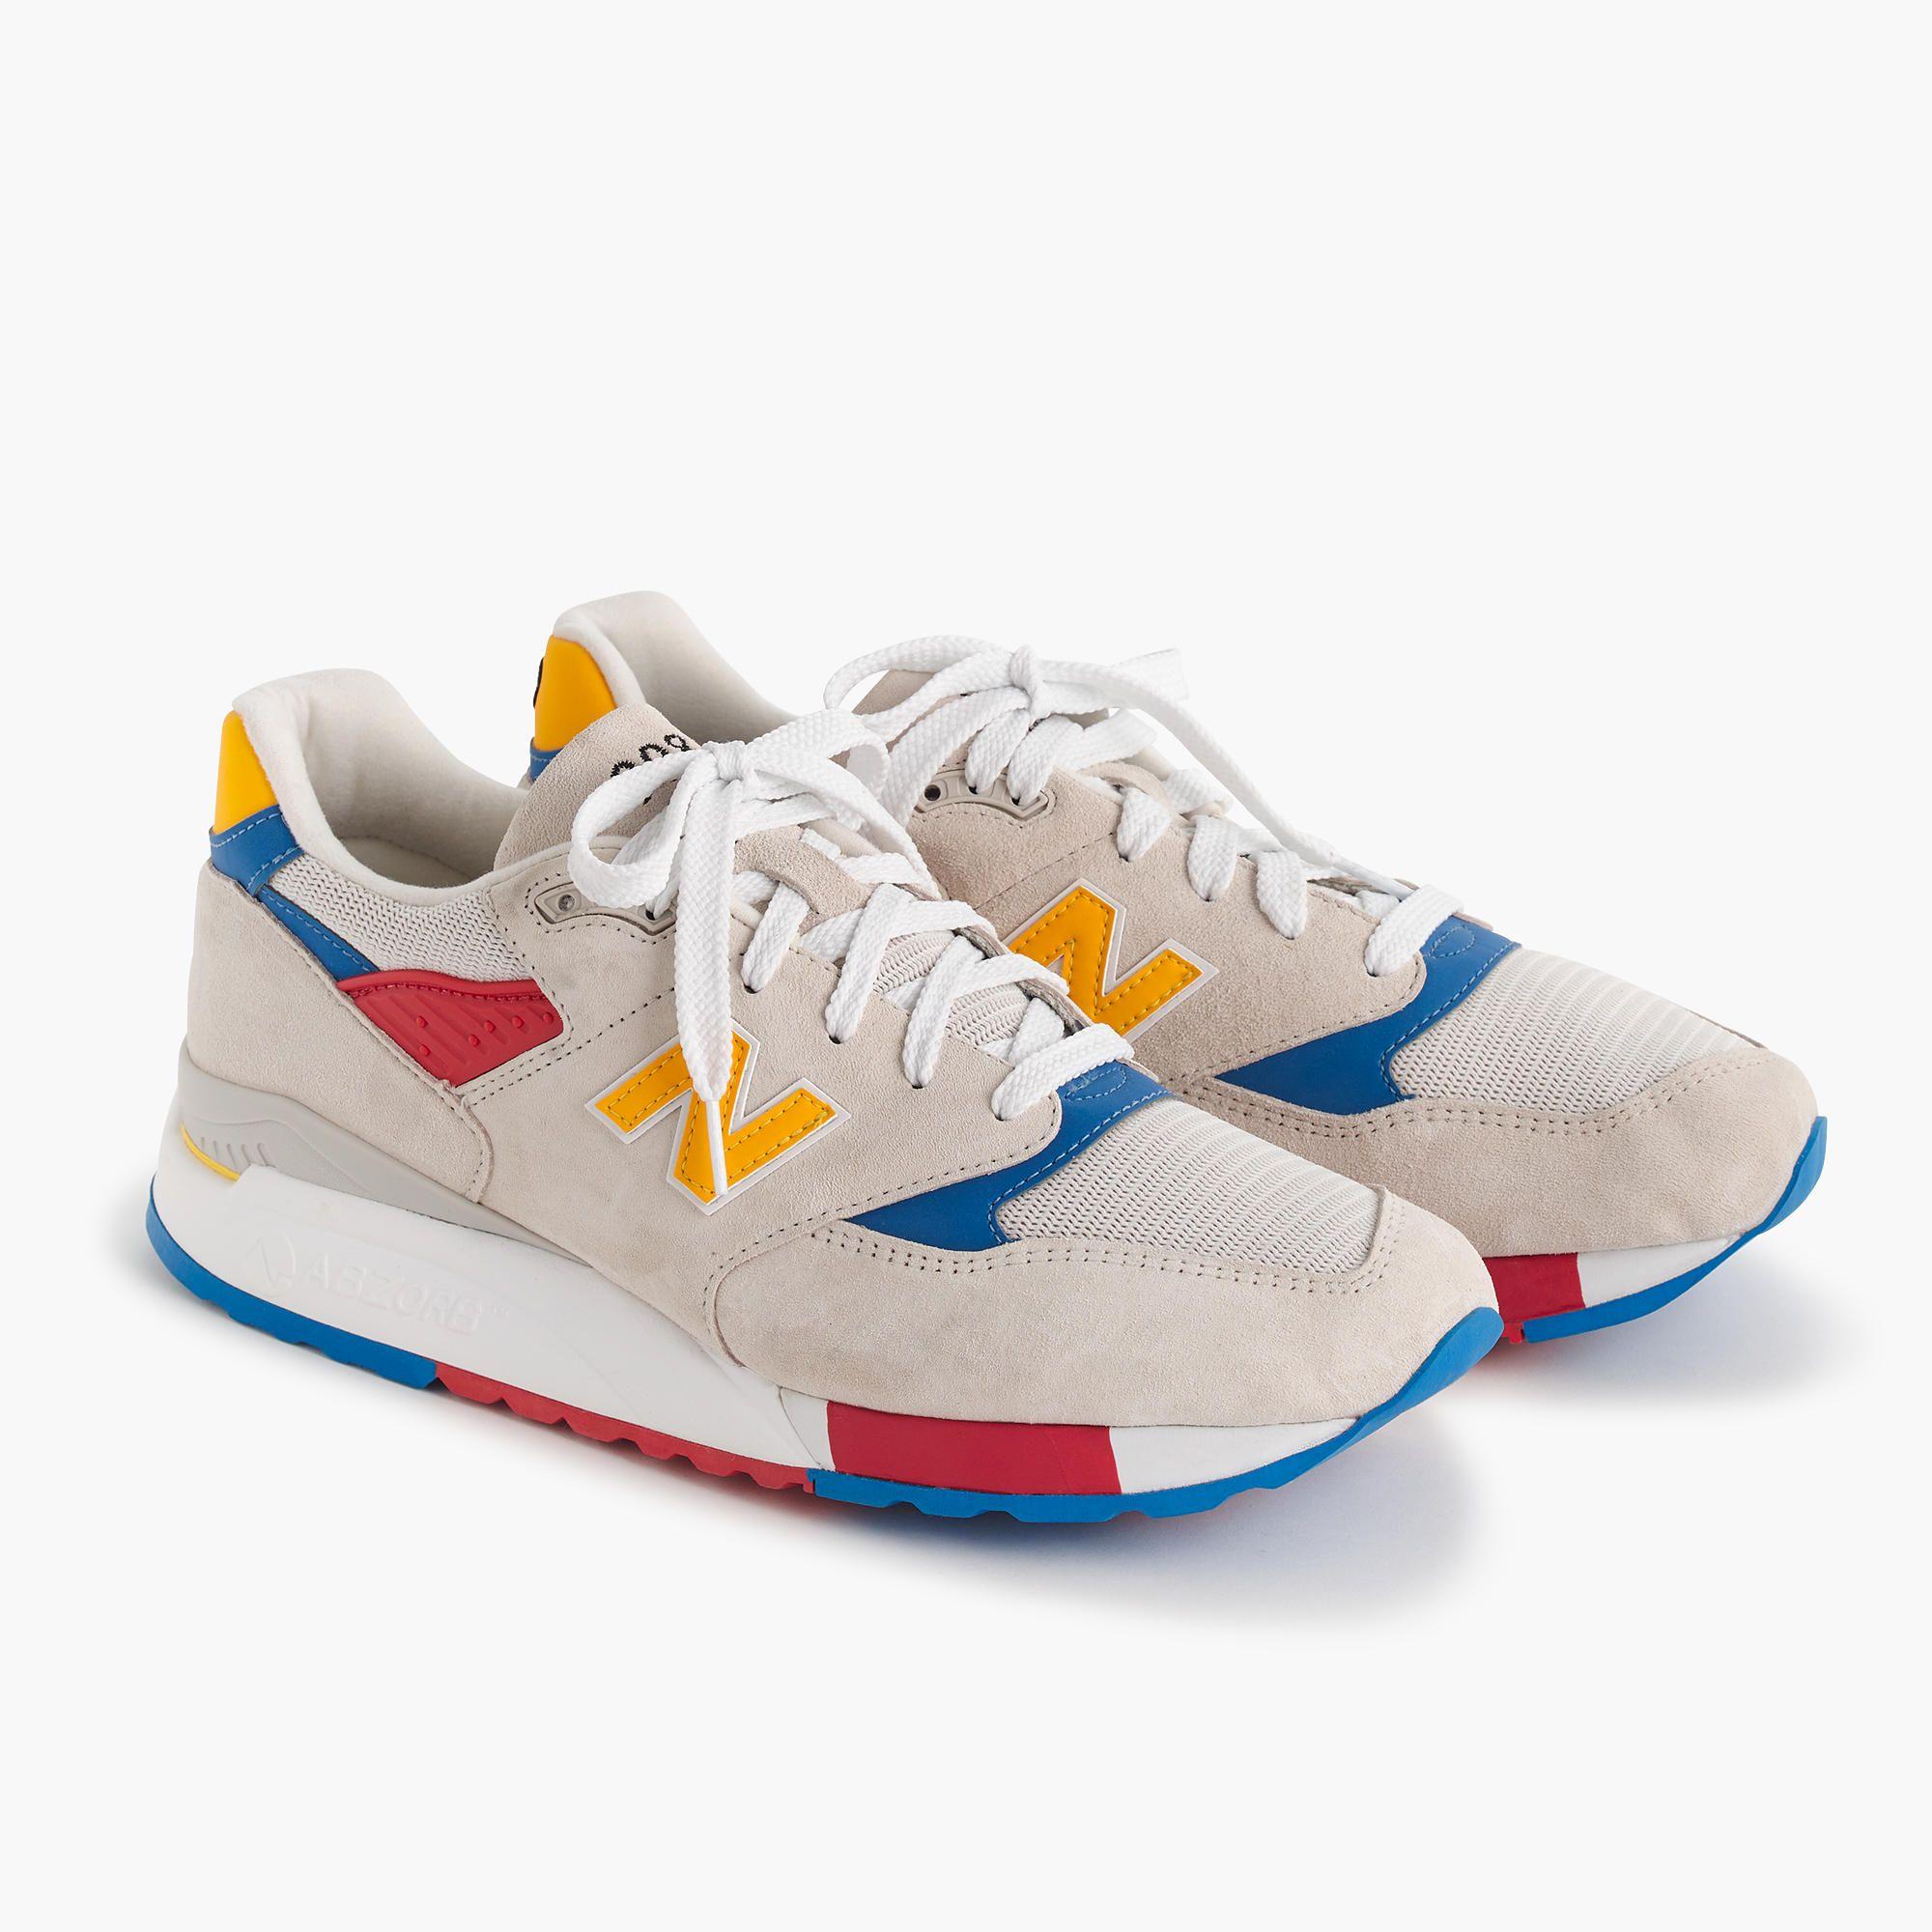 new balance shoes for men 420 festival 2018 dc cherry